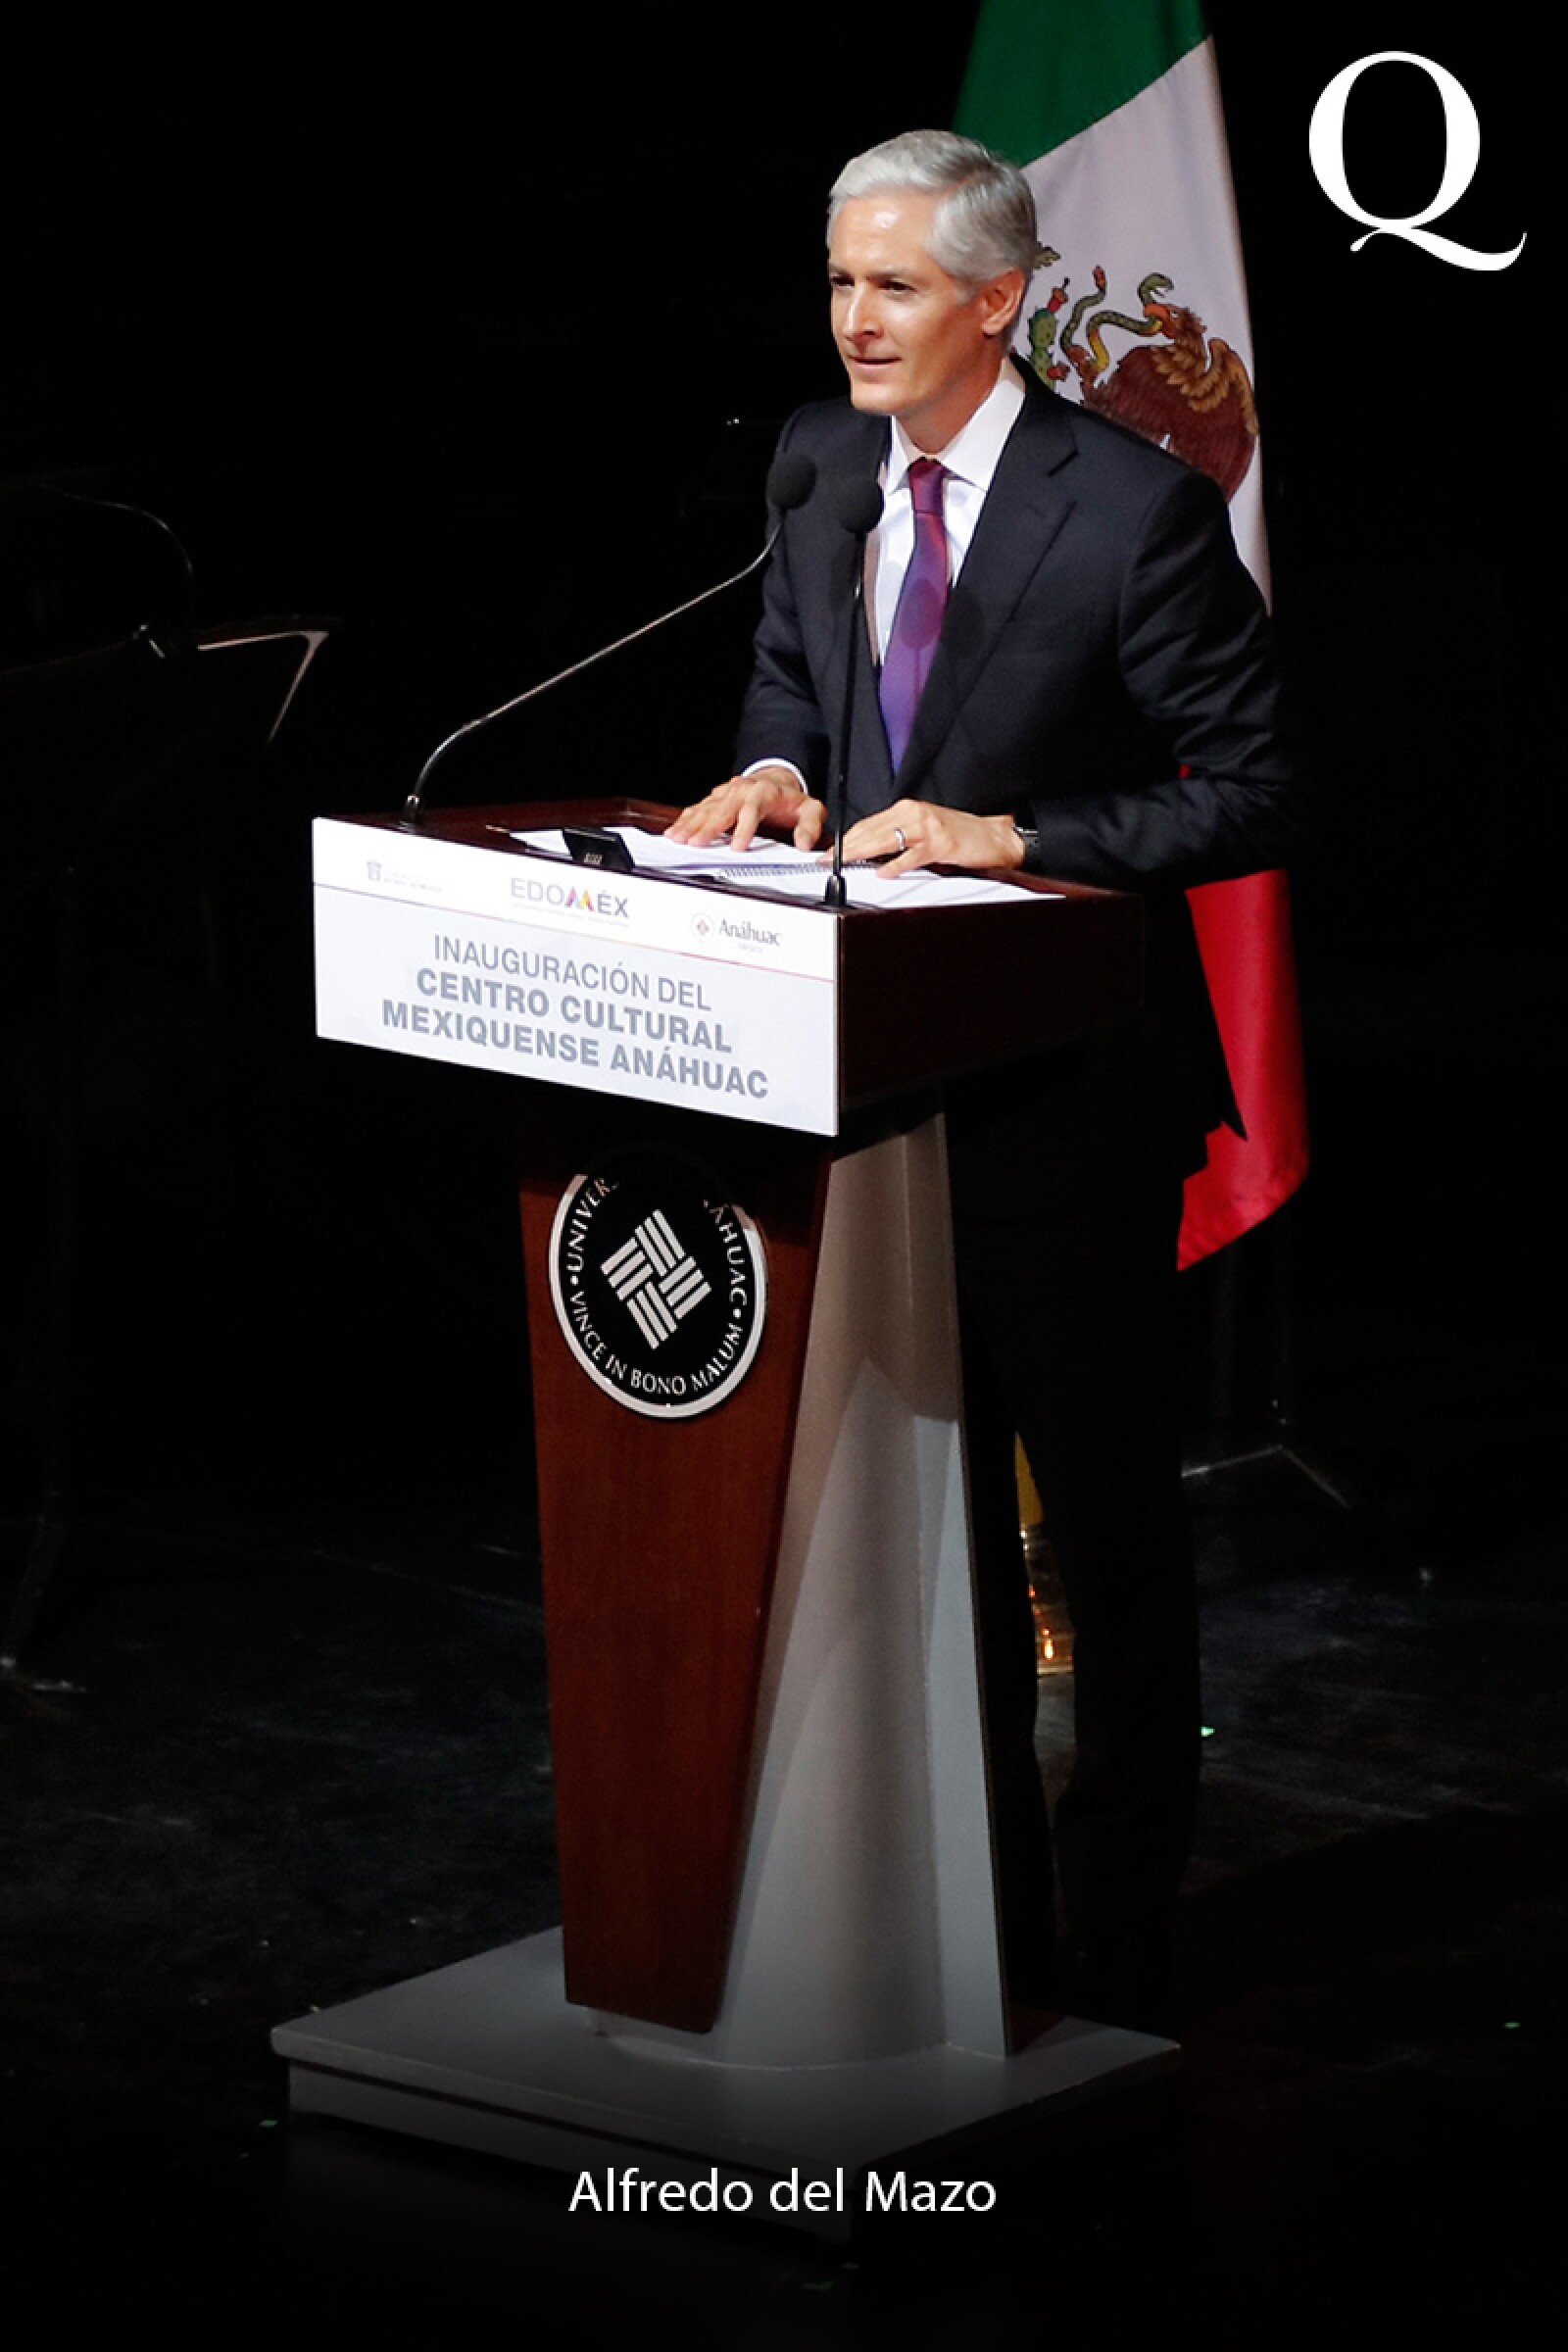 Ricardo Bernal Valderrama